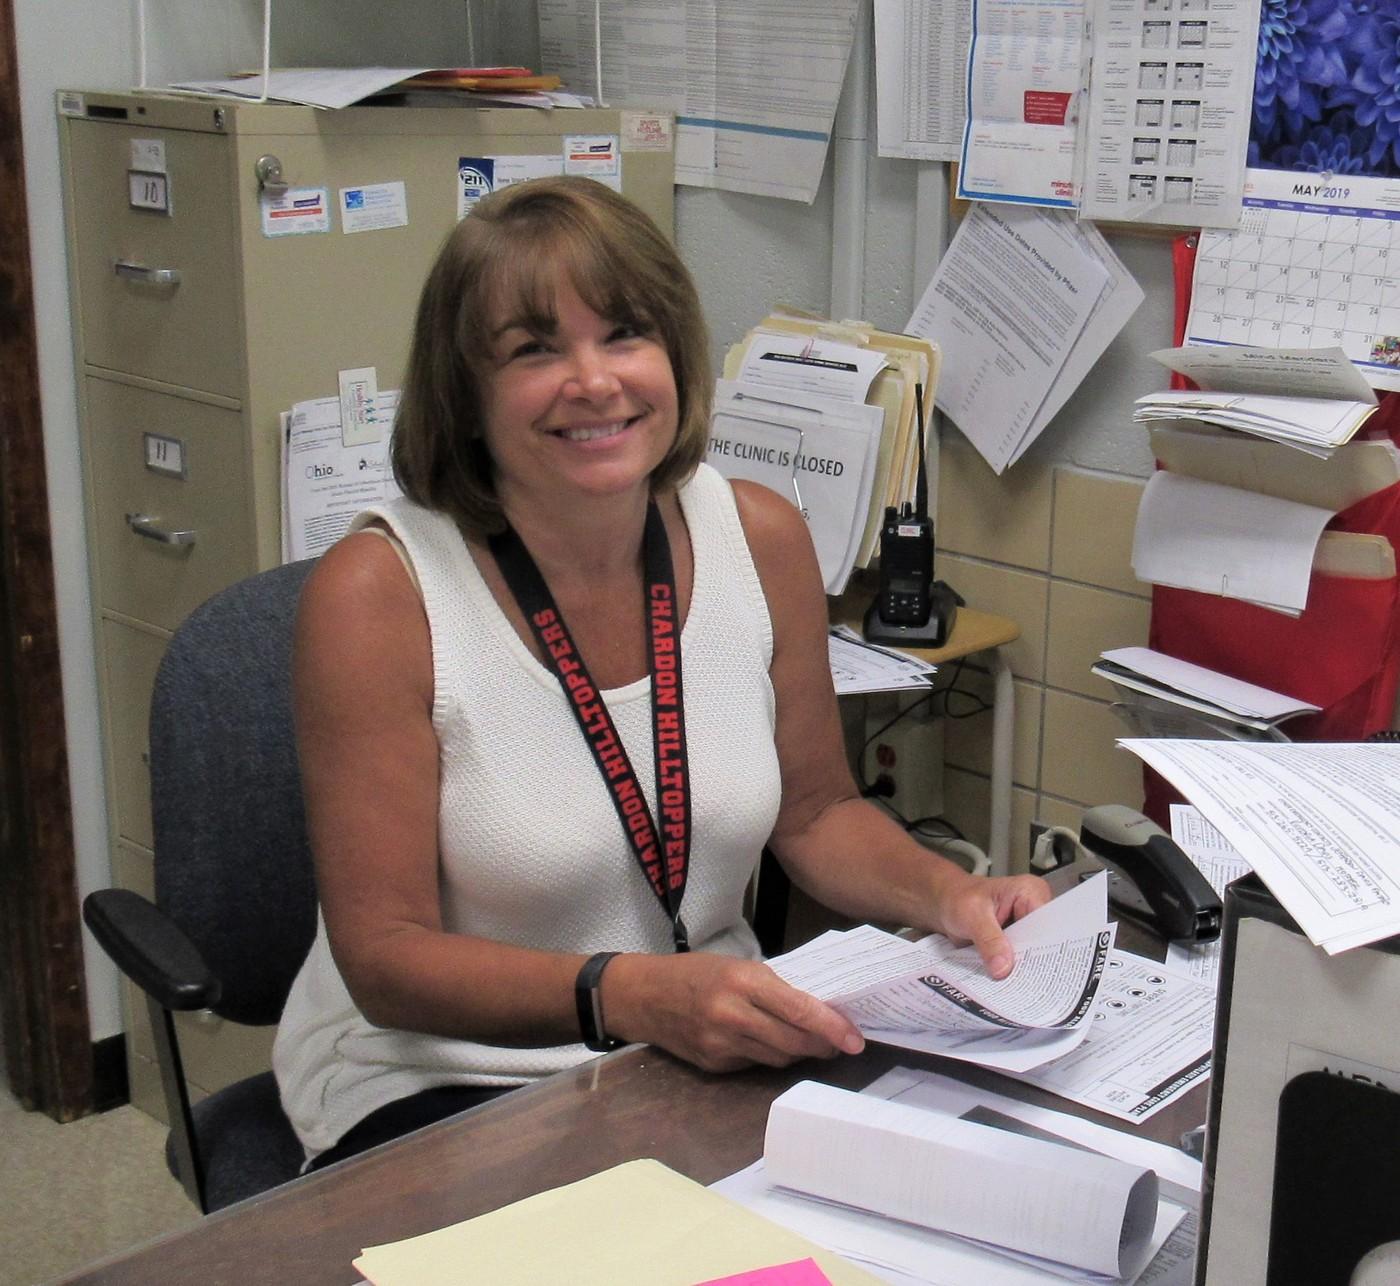 Janice Hoffmann, School Nurse